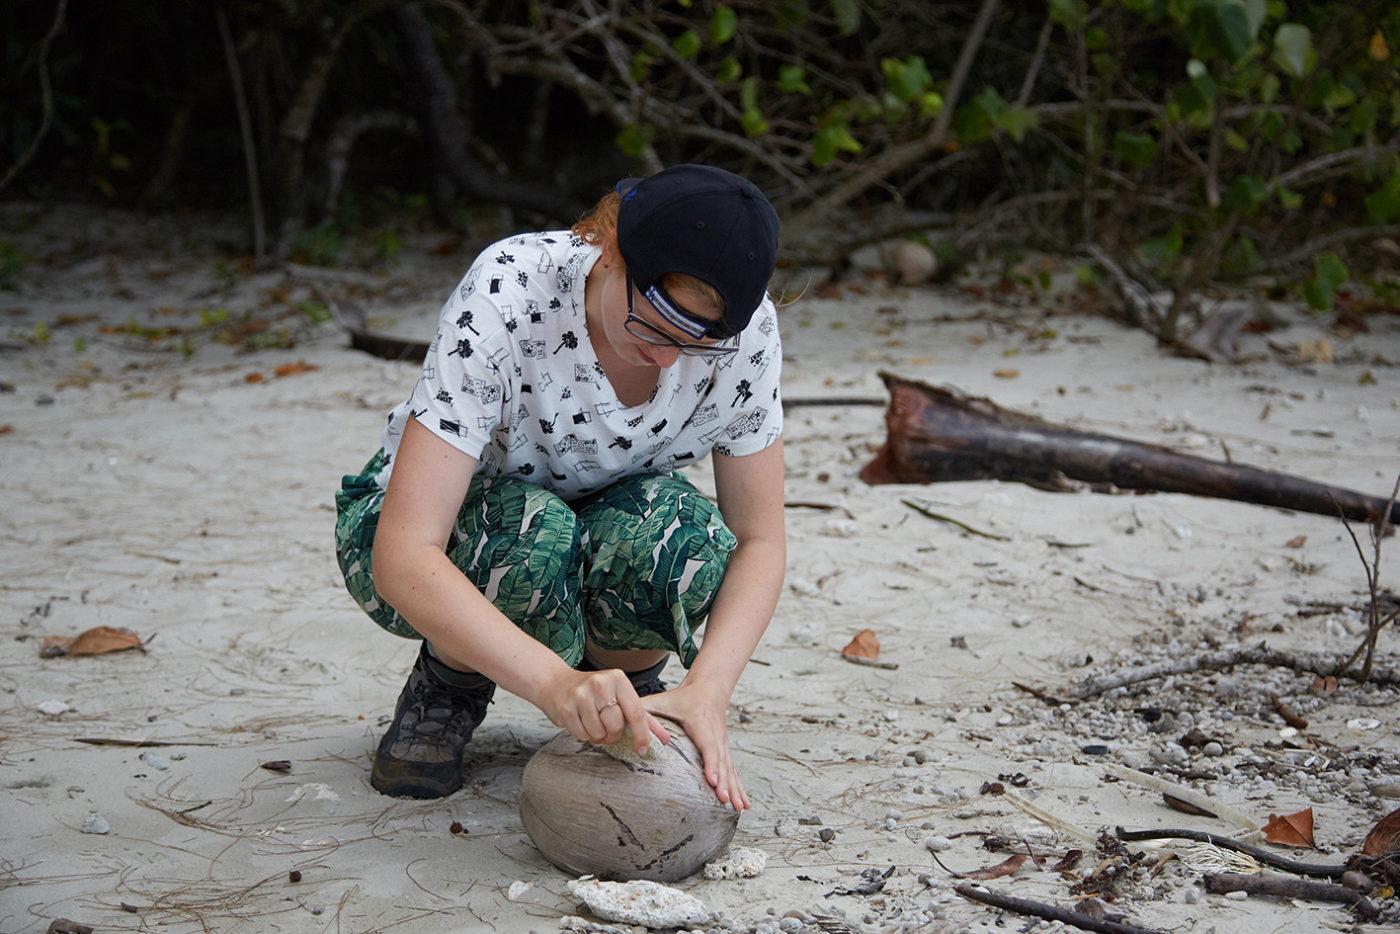 cracking a coconut, australien, australia, kokosnuss, knacken, milesandshores, reiseblog, reiseblogger